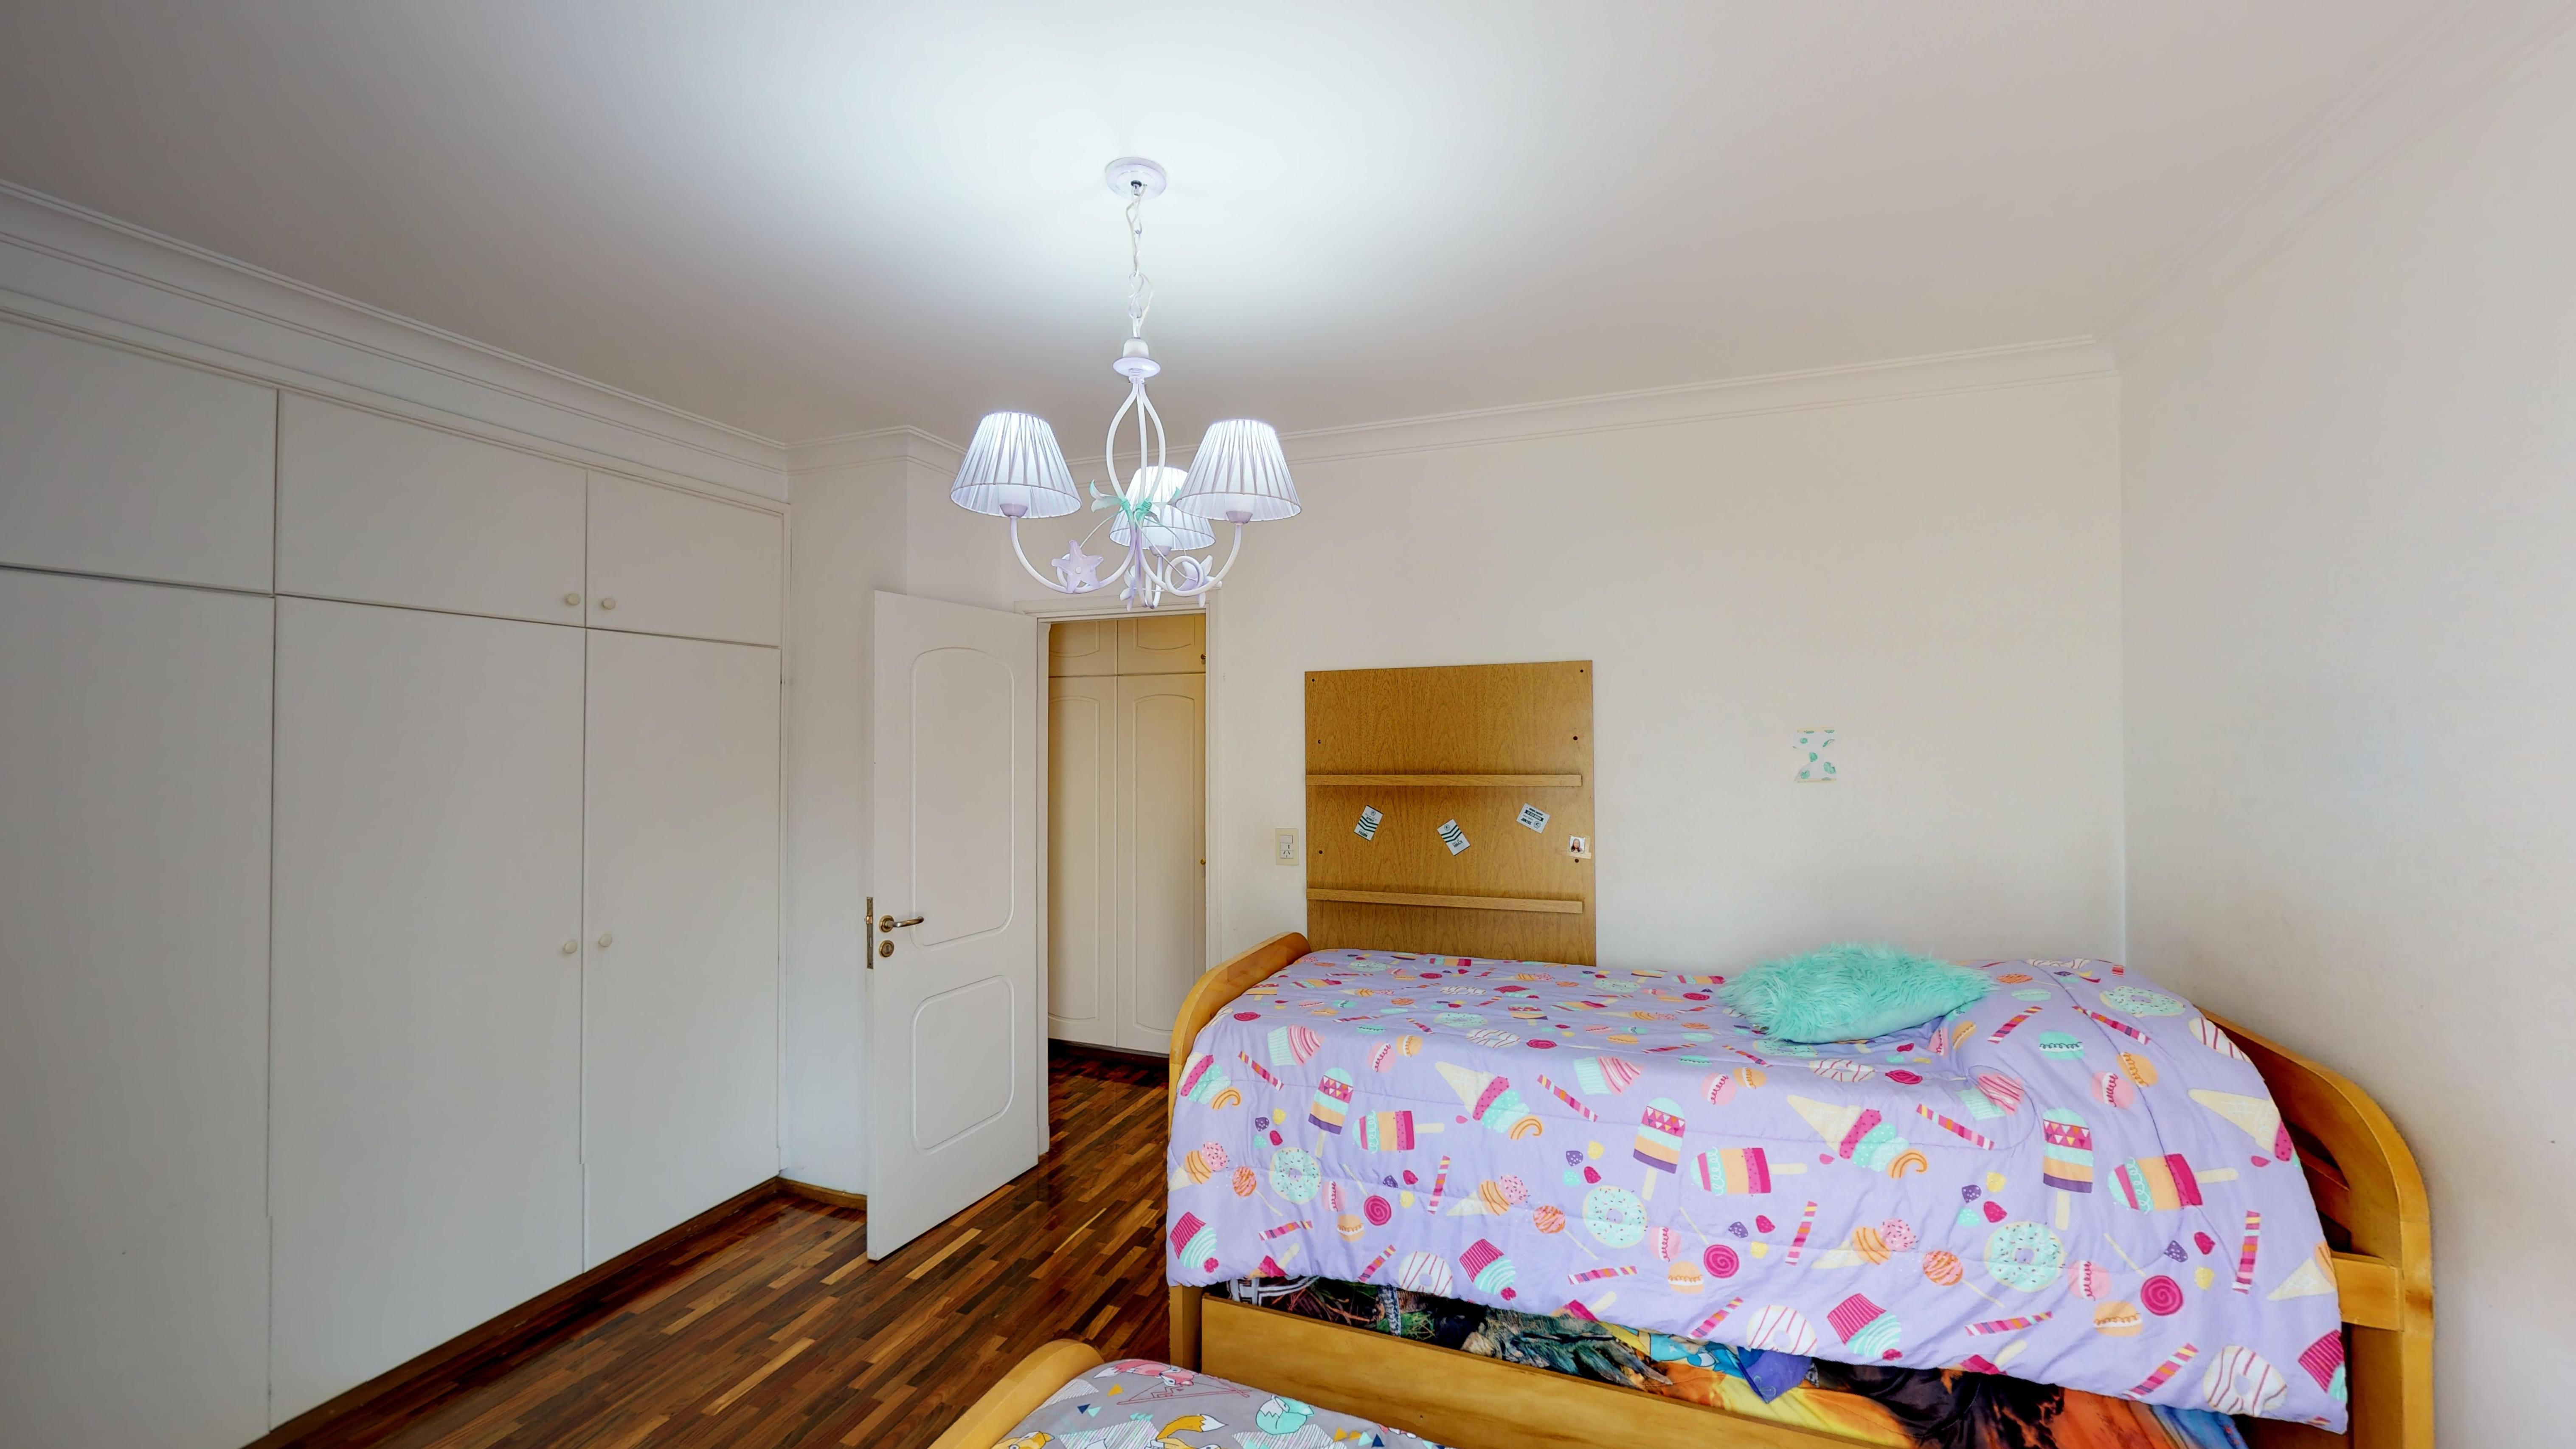 Dormitorio con balcon al contrafrente